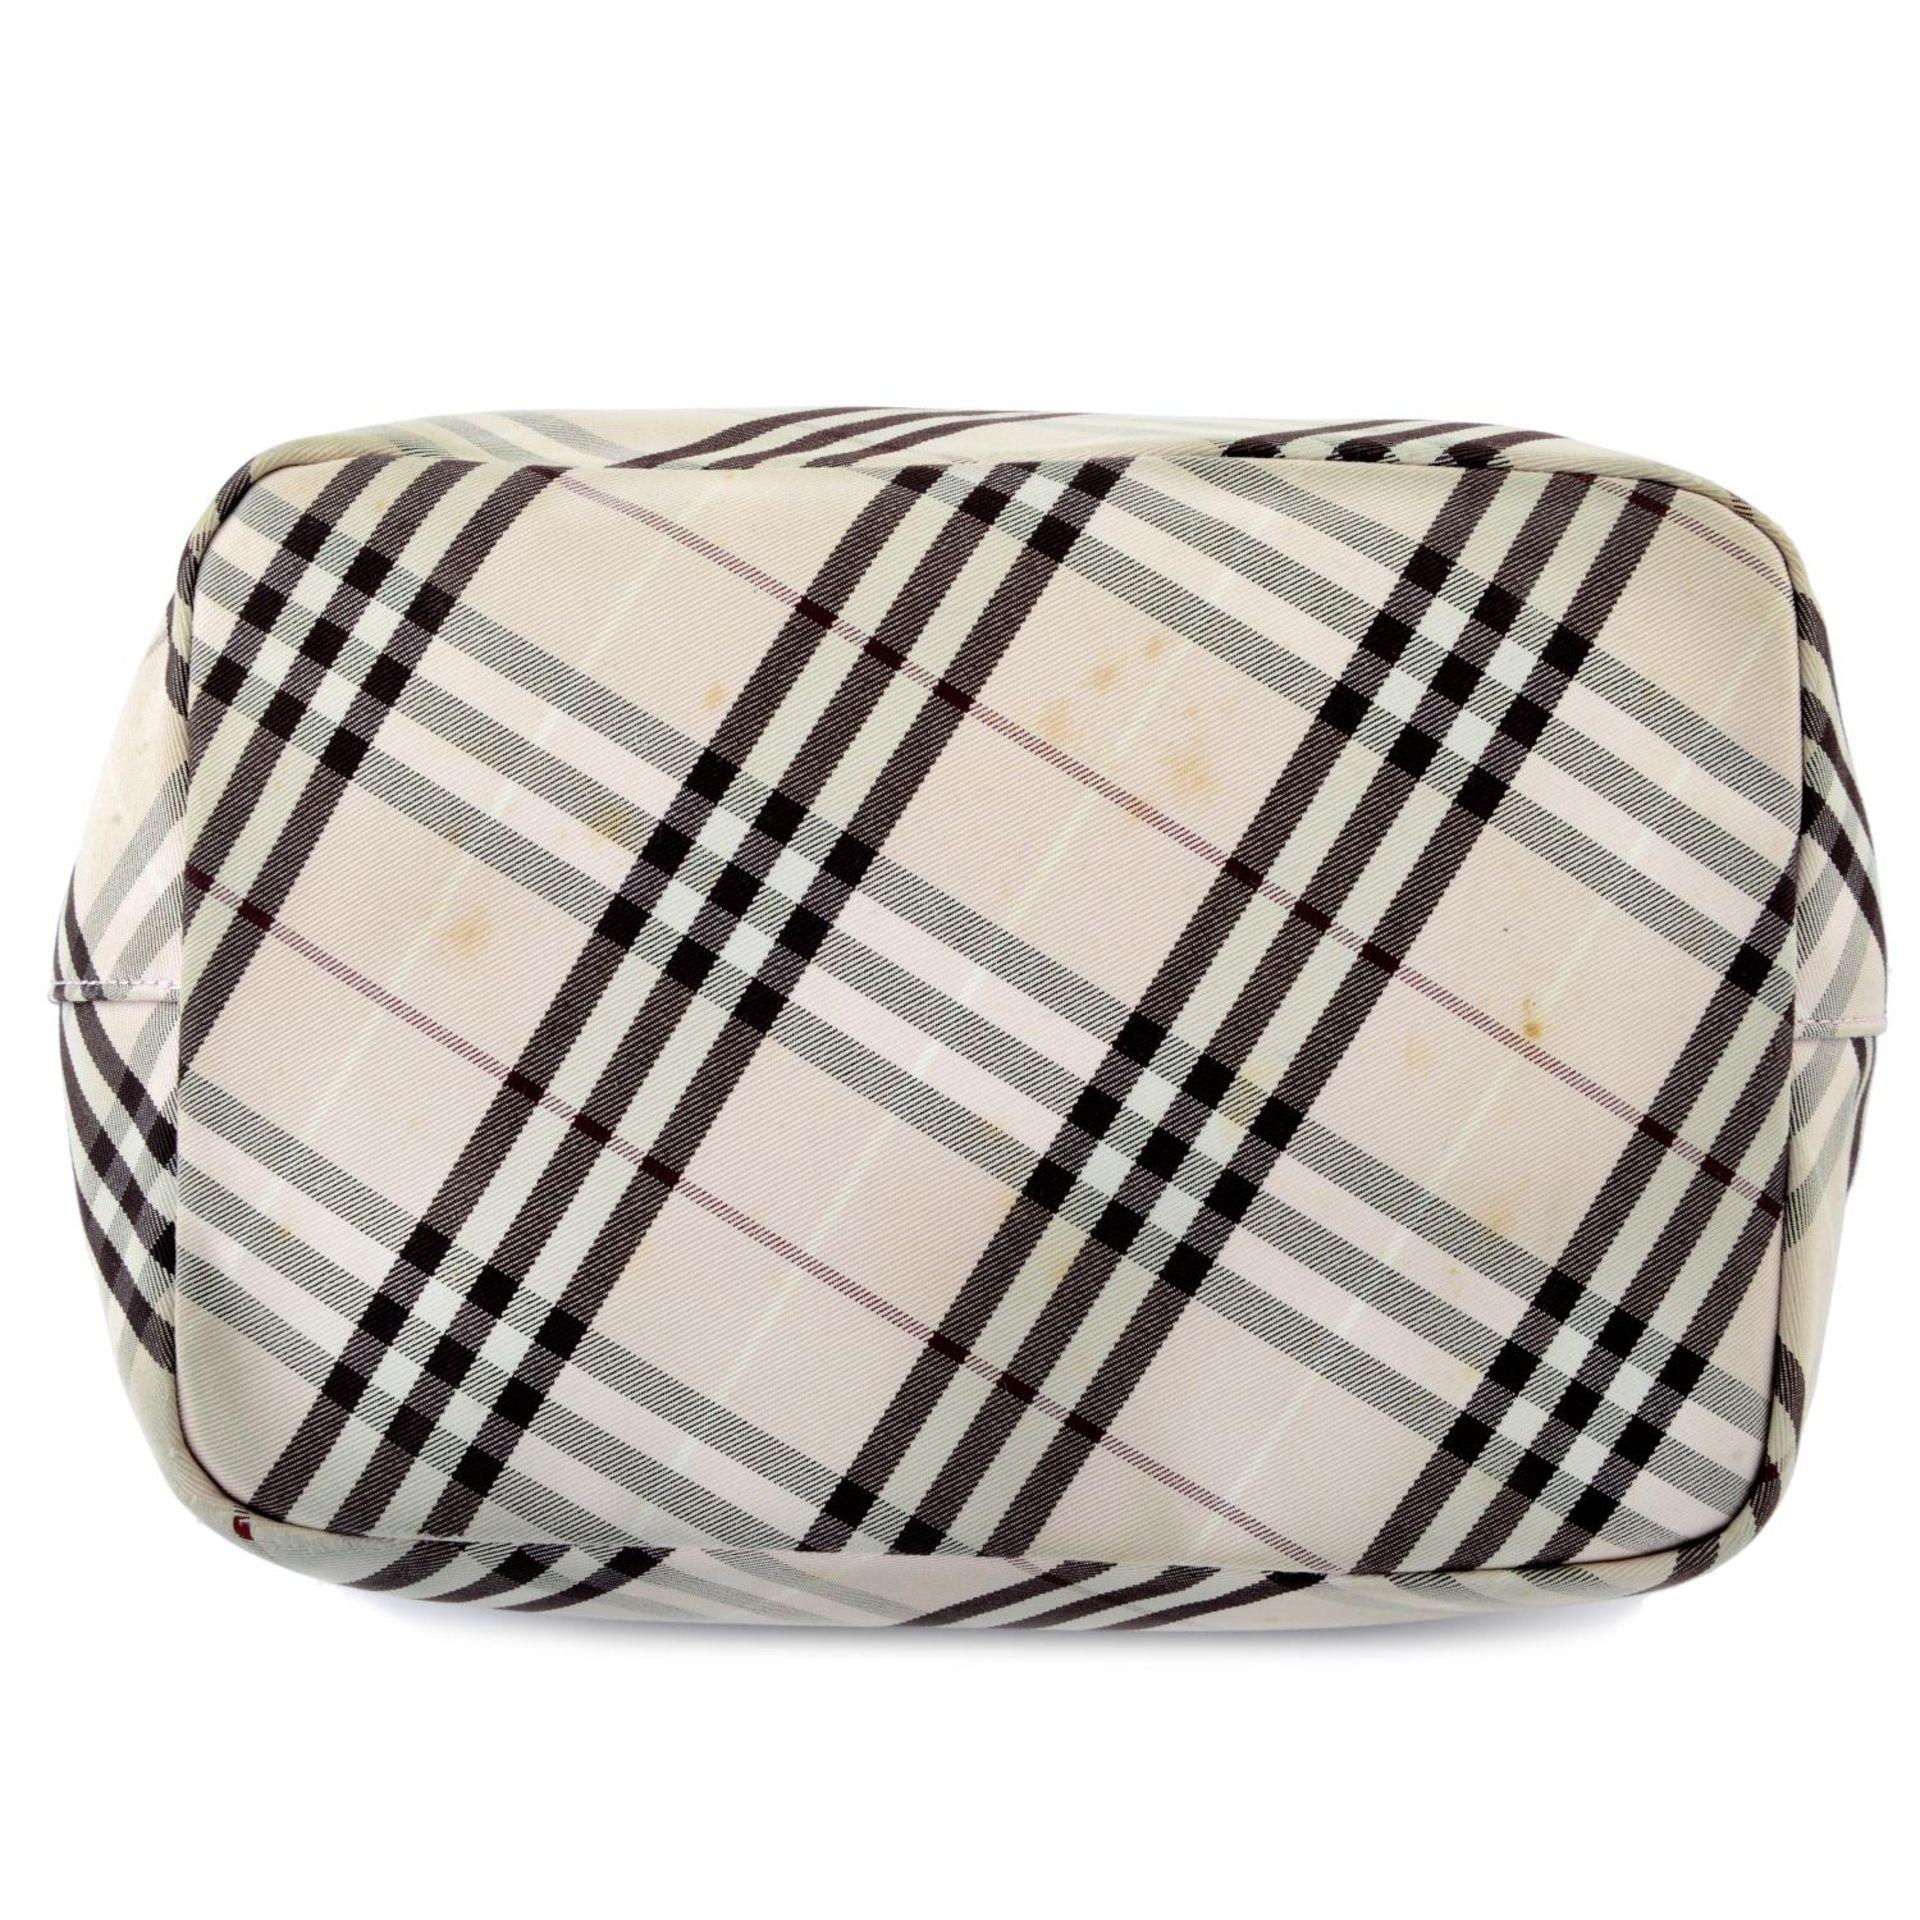 BURBERRY - a Blue Label reversible handbag. - Image 3 of 5